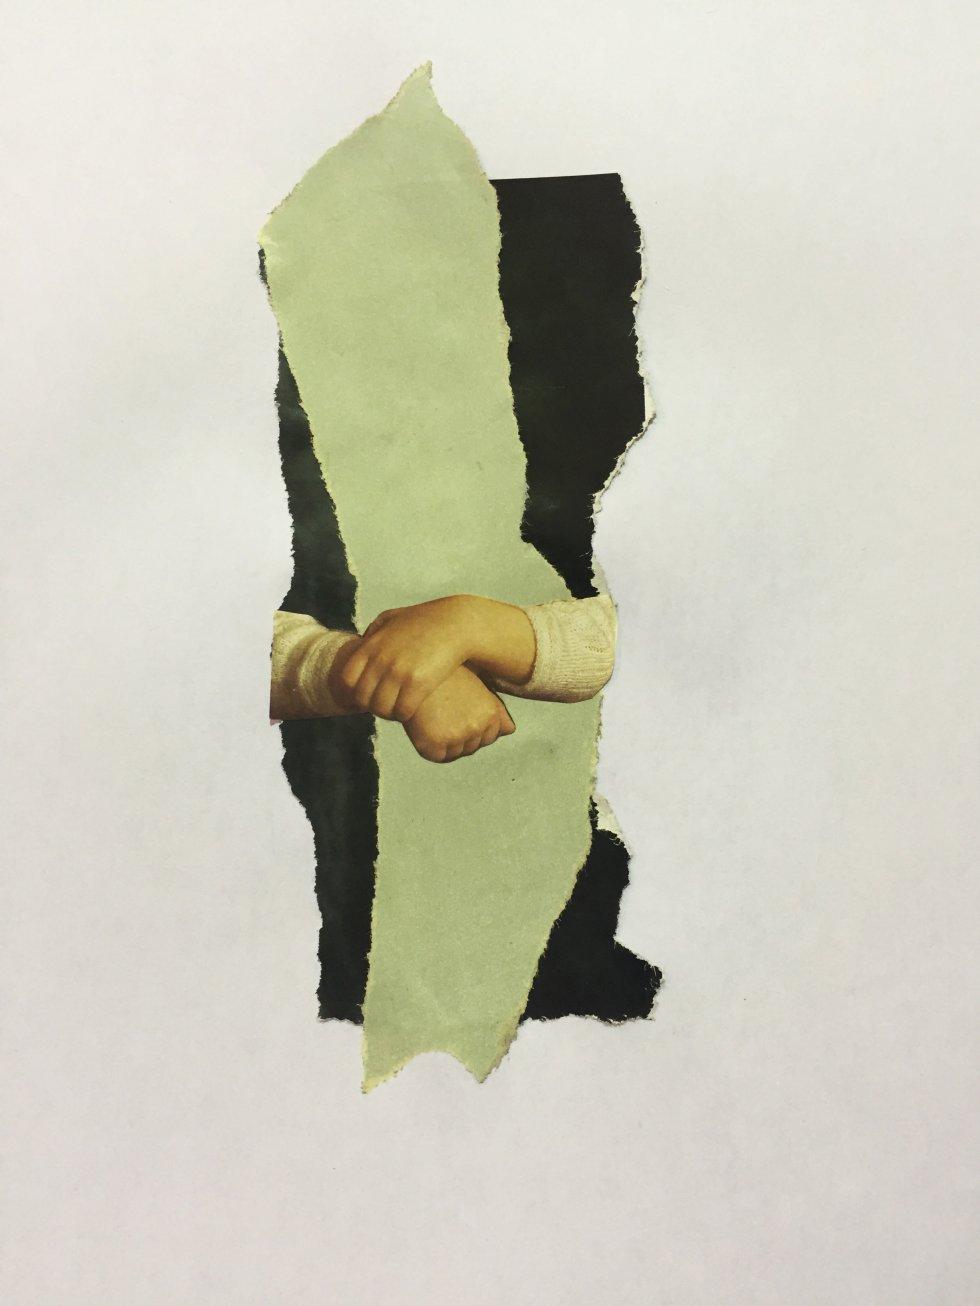 Piel (2016) - Lina Ávila - Collage Republic